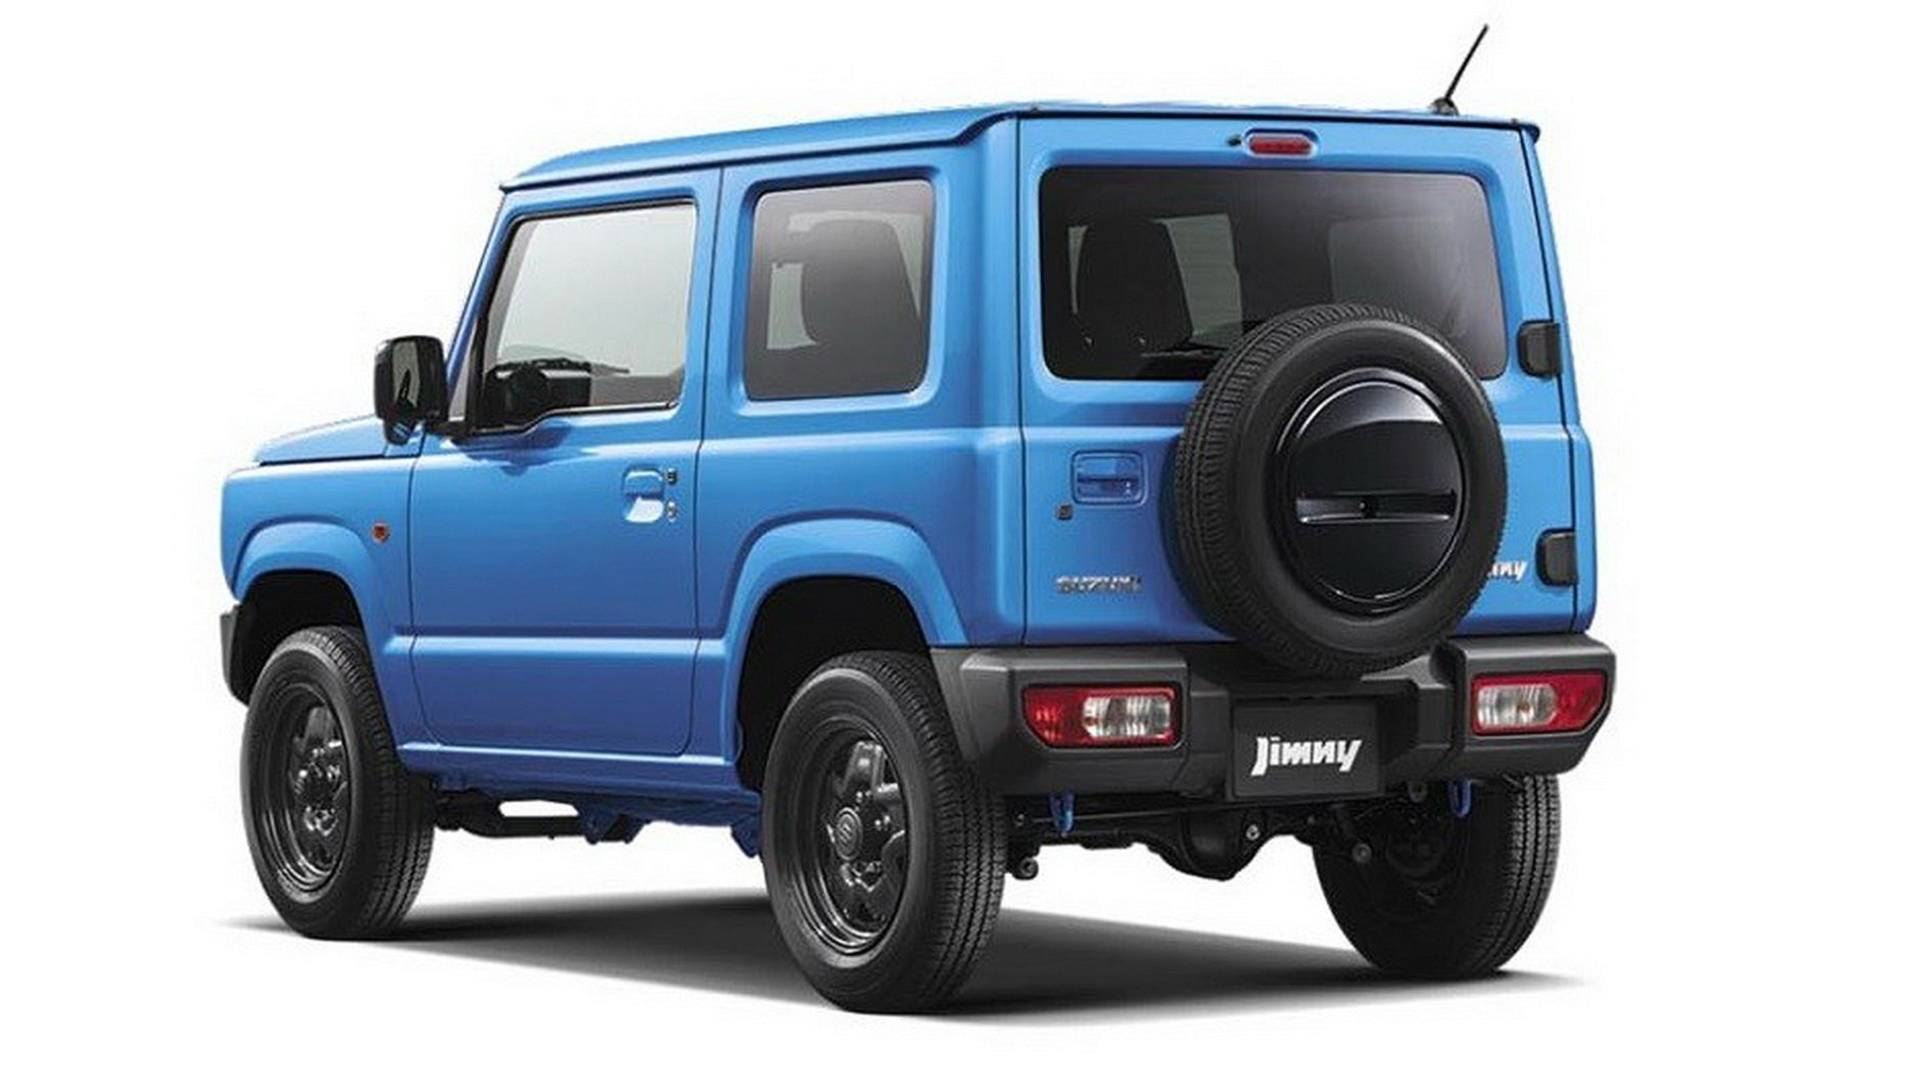 Suzuki Jimny 2018 Australia >> 小巧硬朗,新一代 Suzuki Jimny 官图发布, 7月5日亮相 New Suzuki Jimny 7 - Paul Tan 汽车资讯网